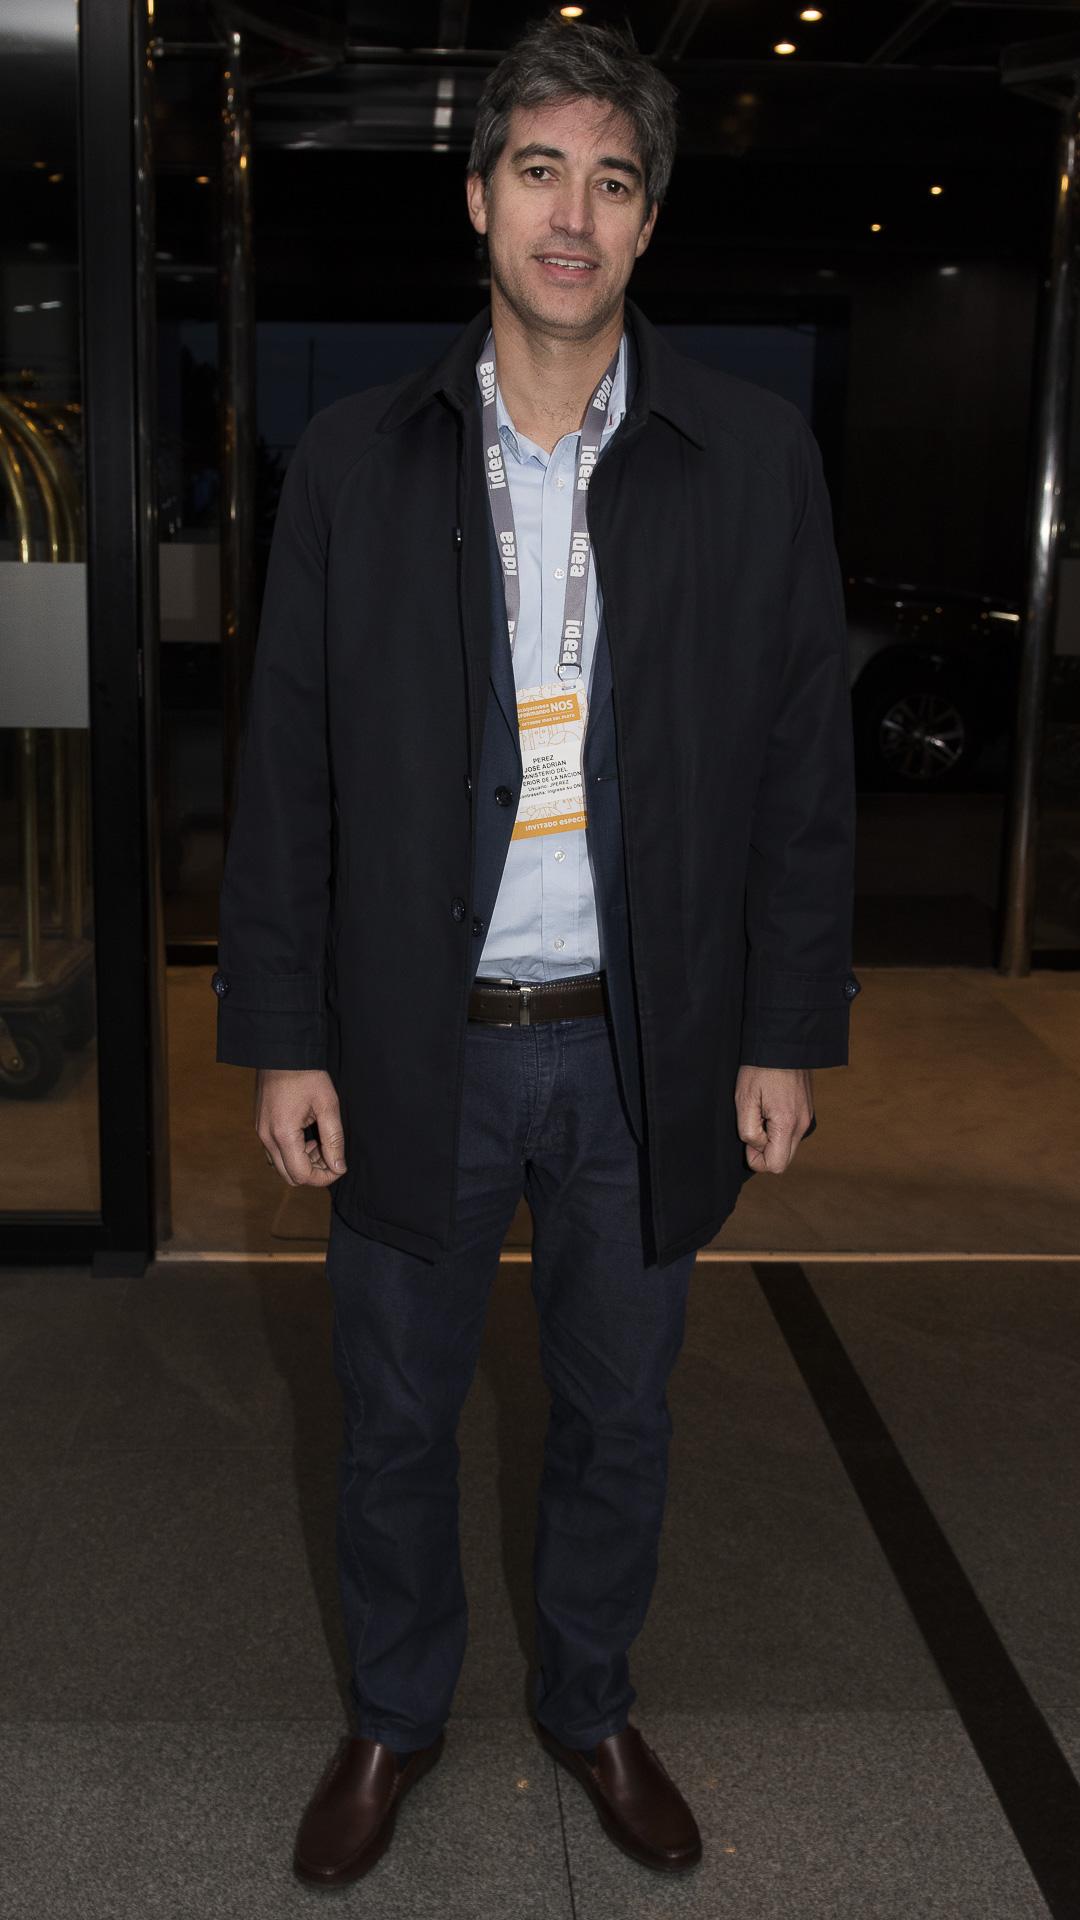 Adrián Pérez , secrretario de Asuntos Polìticos e Institucionales de la Naciòn